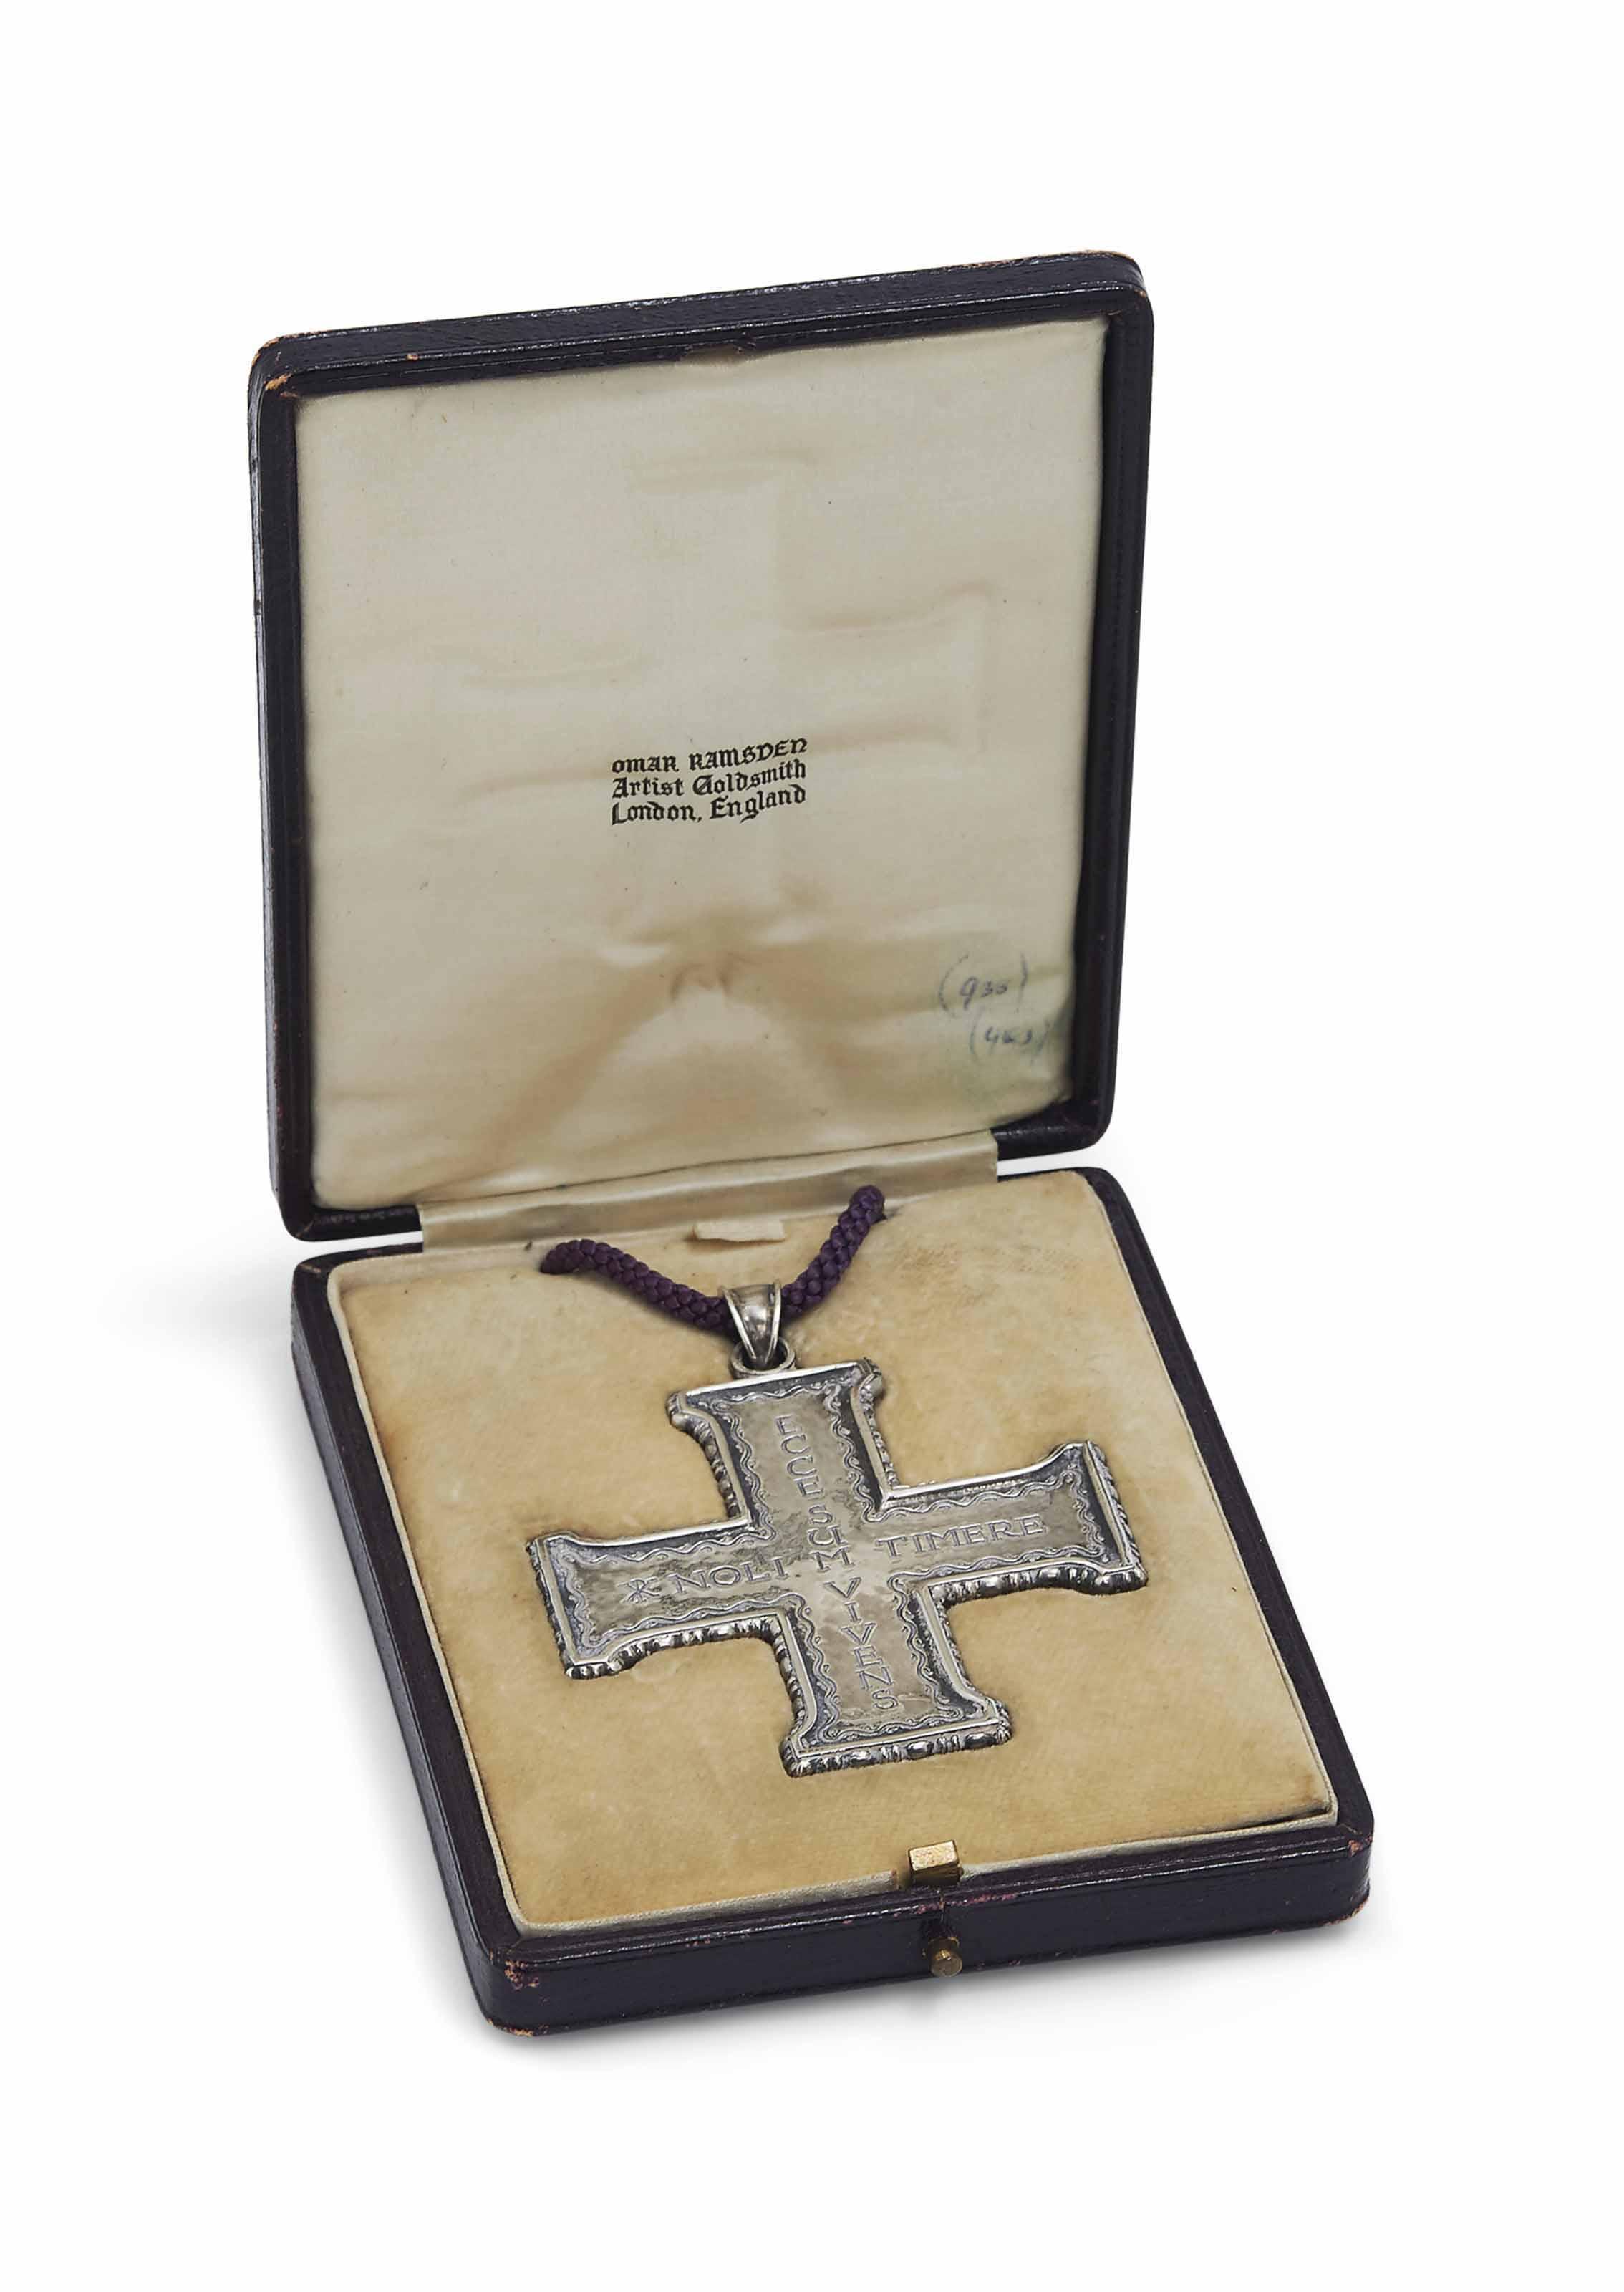 AN OMAR RAMSDEN (1873-1939) SILVER PECTORAL CROSS ON A PURPLE CORD IN ORIGINAL RAMSDEN BOX